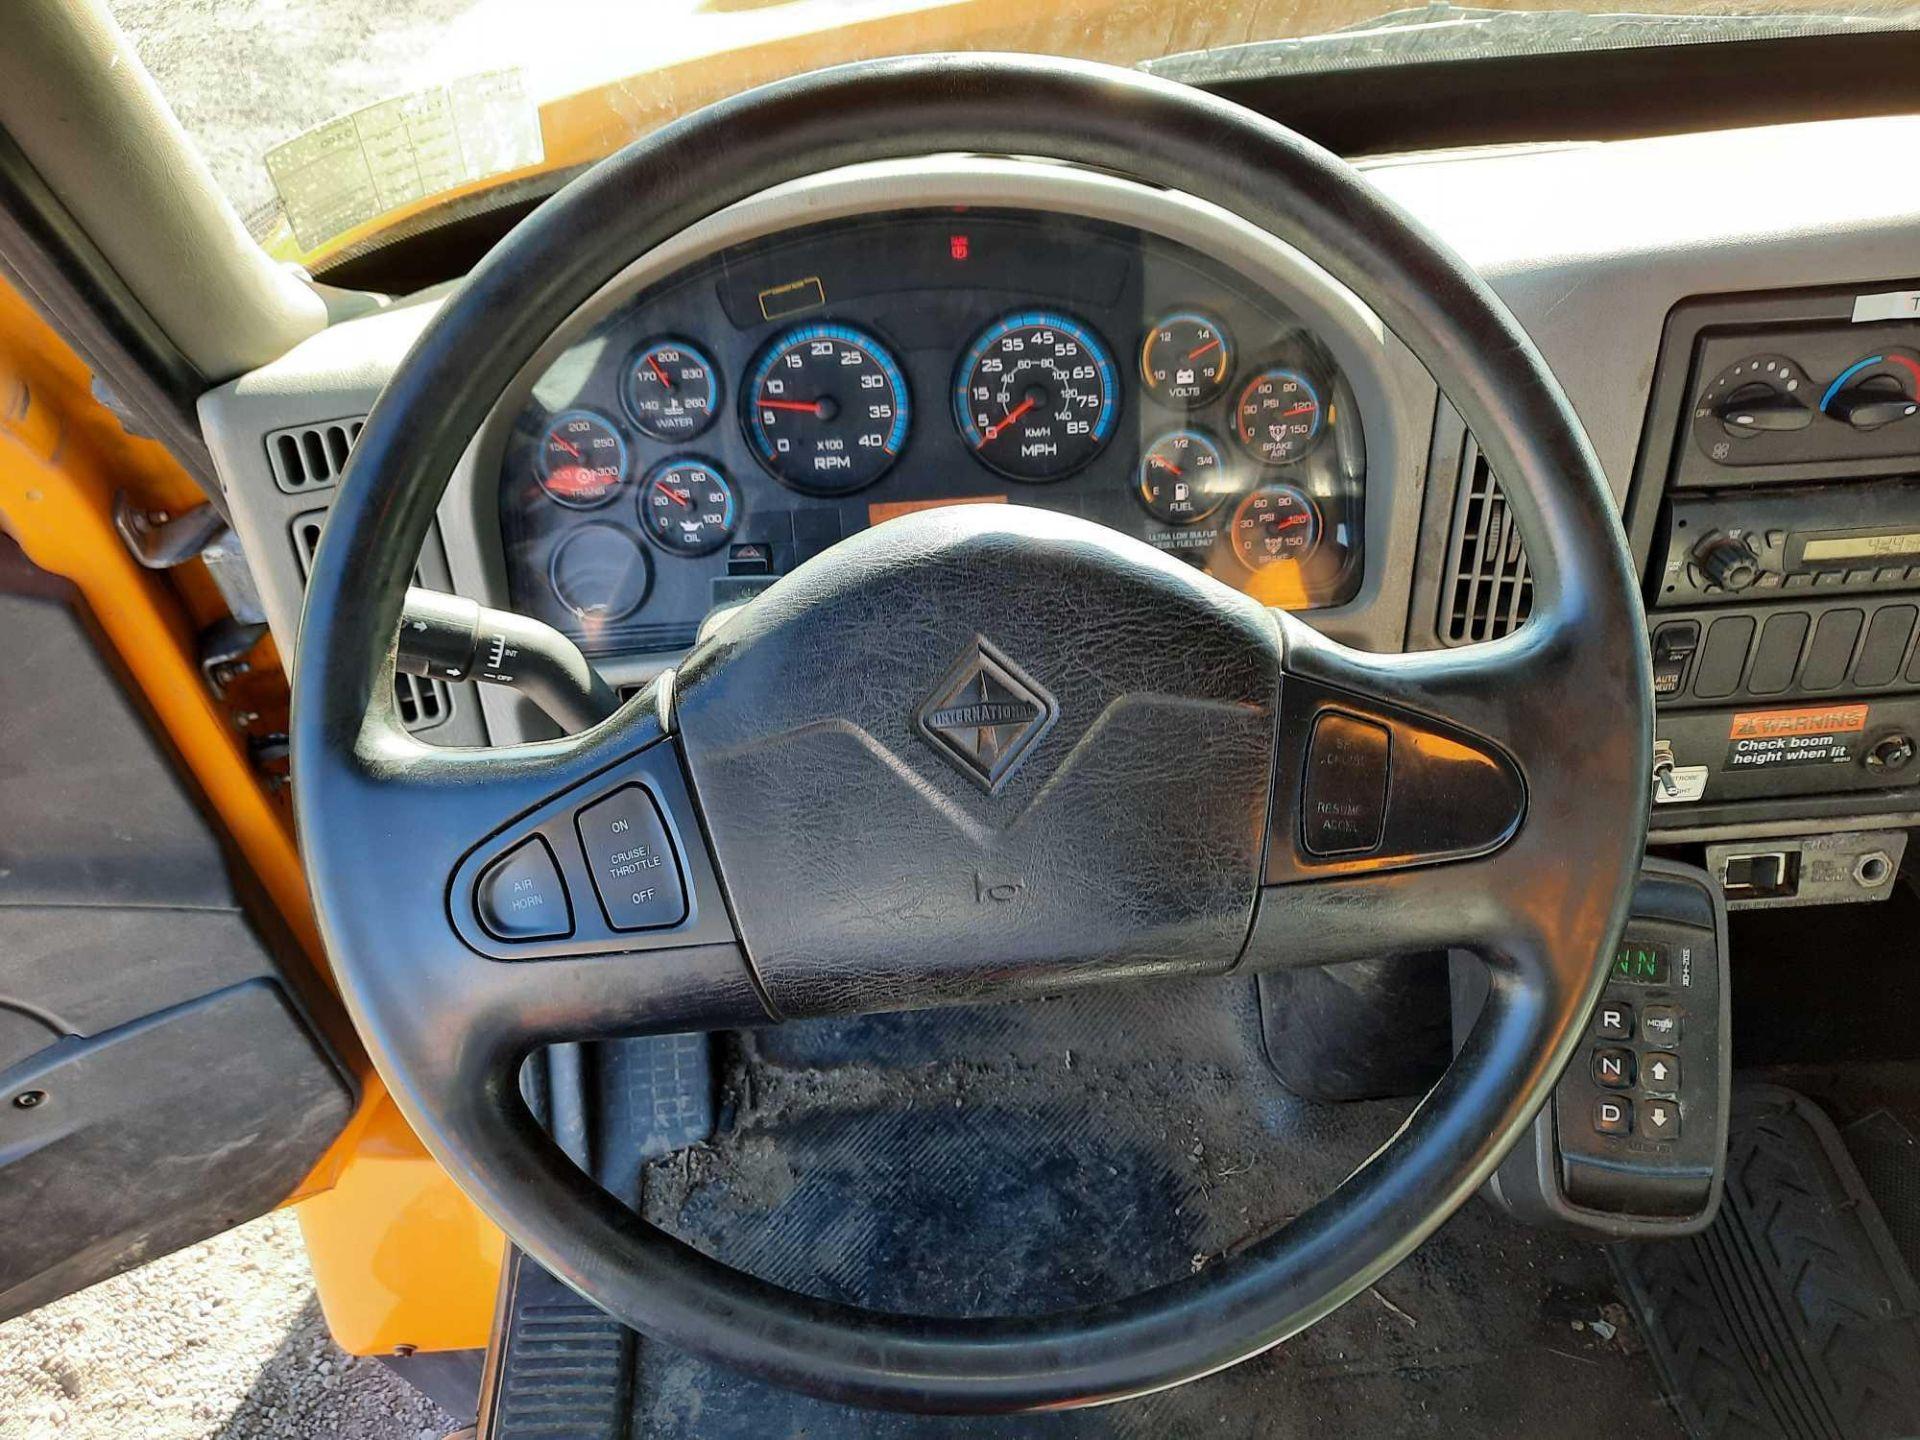 2010 INTERNATIONAL 7300S KNUCKLEBOOM TRUCK - Image 7 of 18